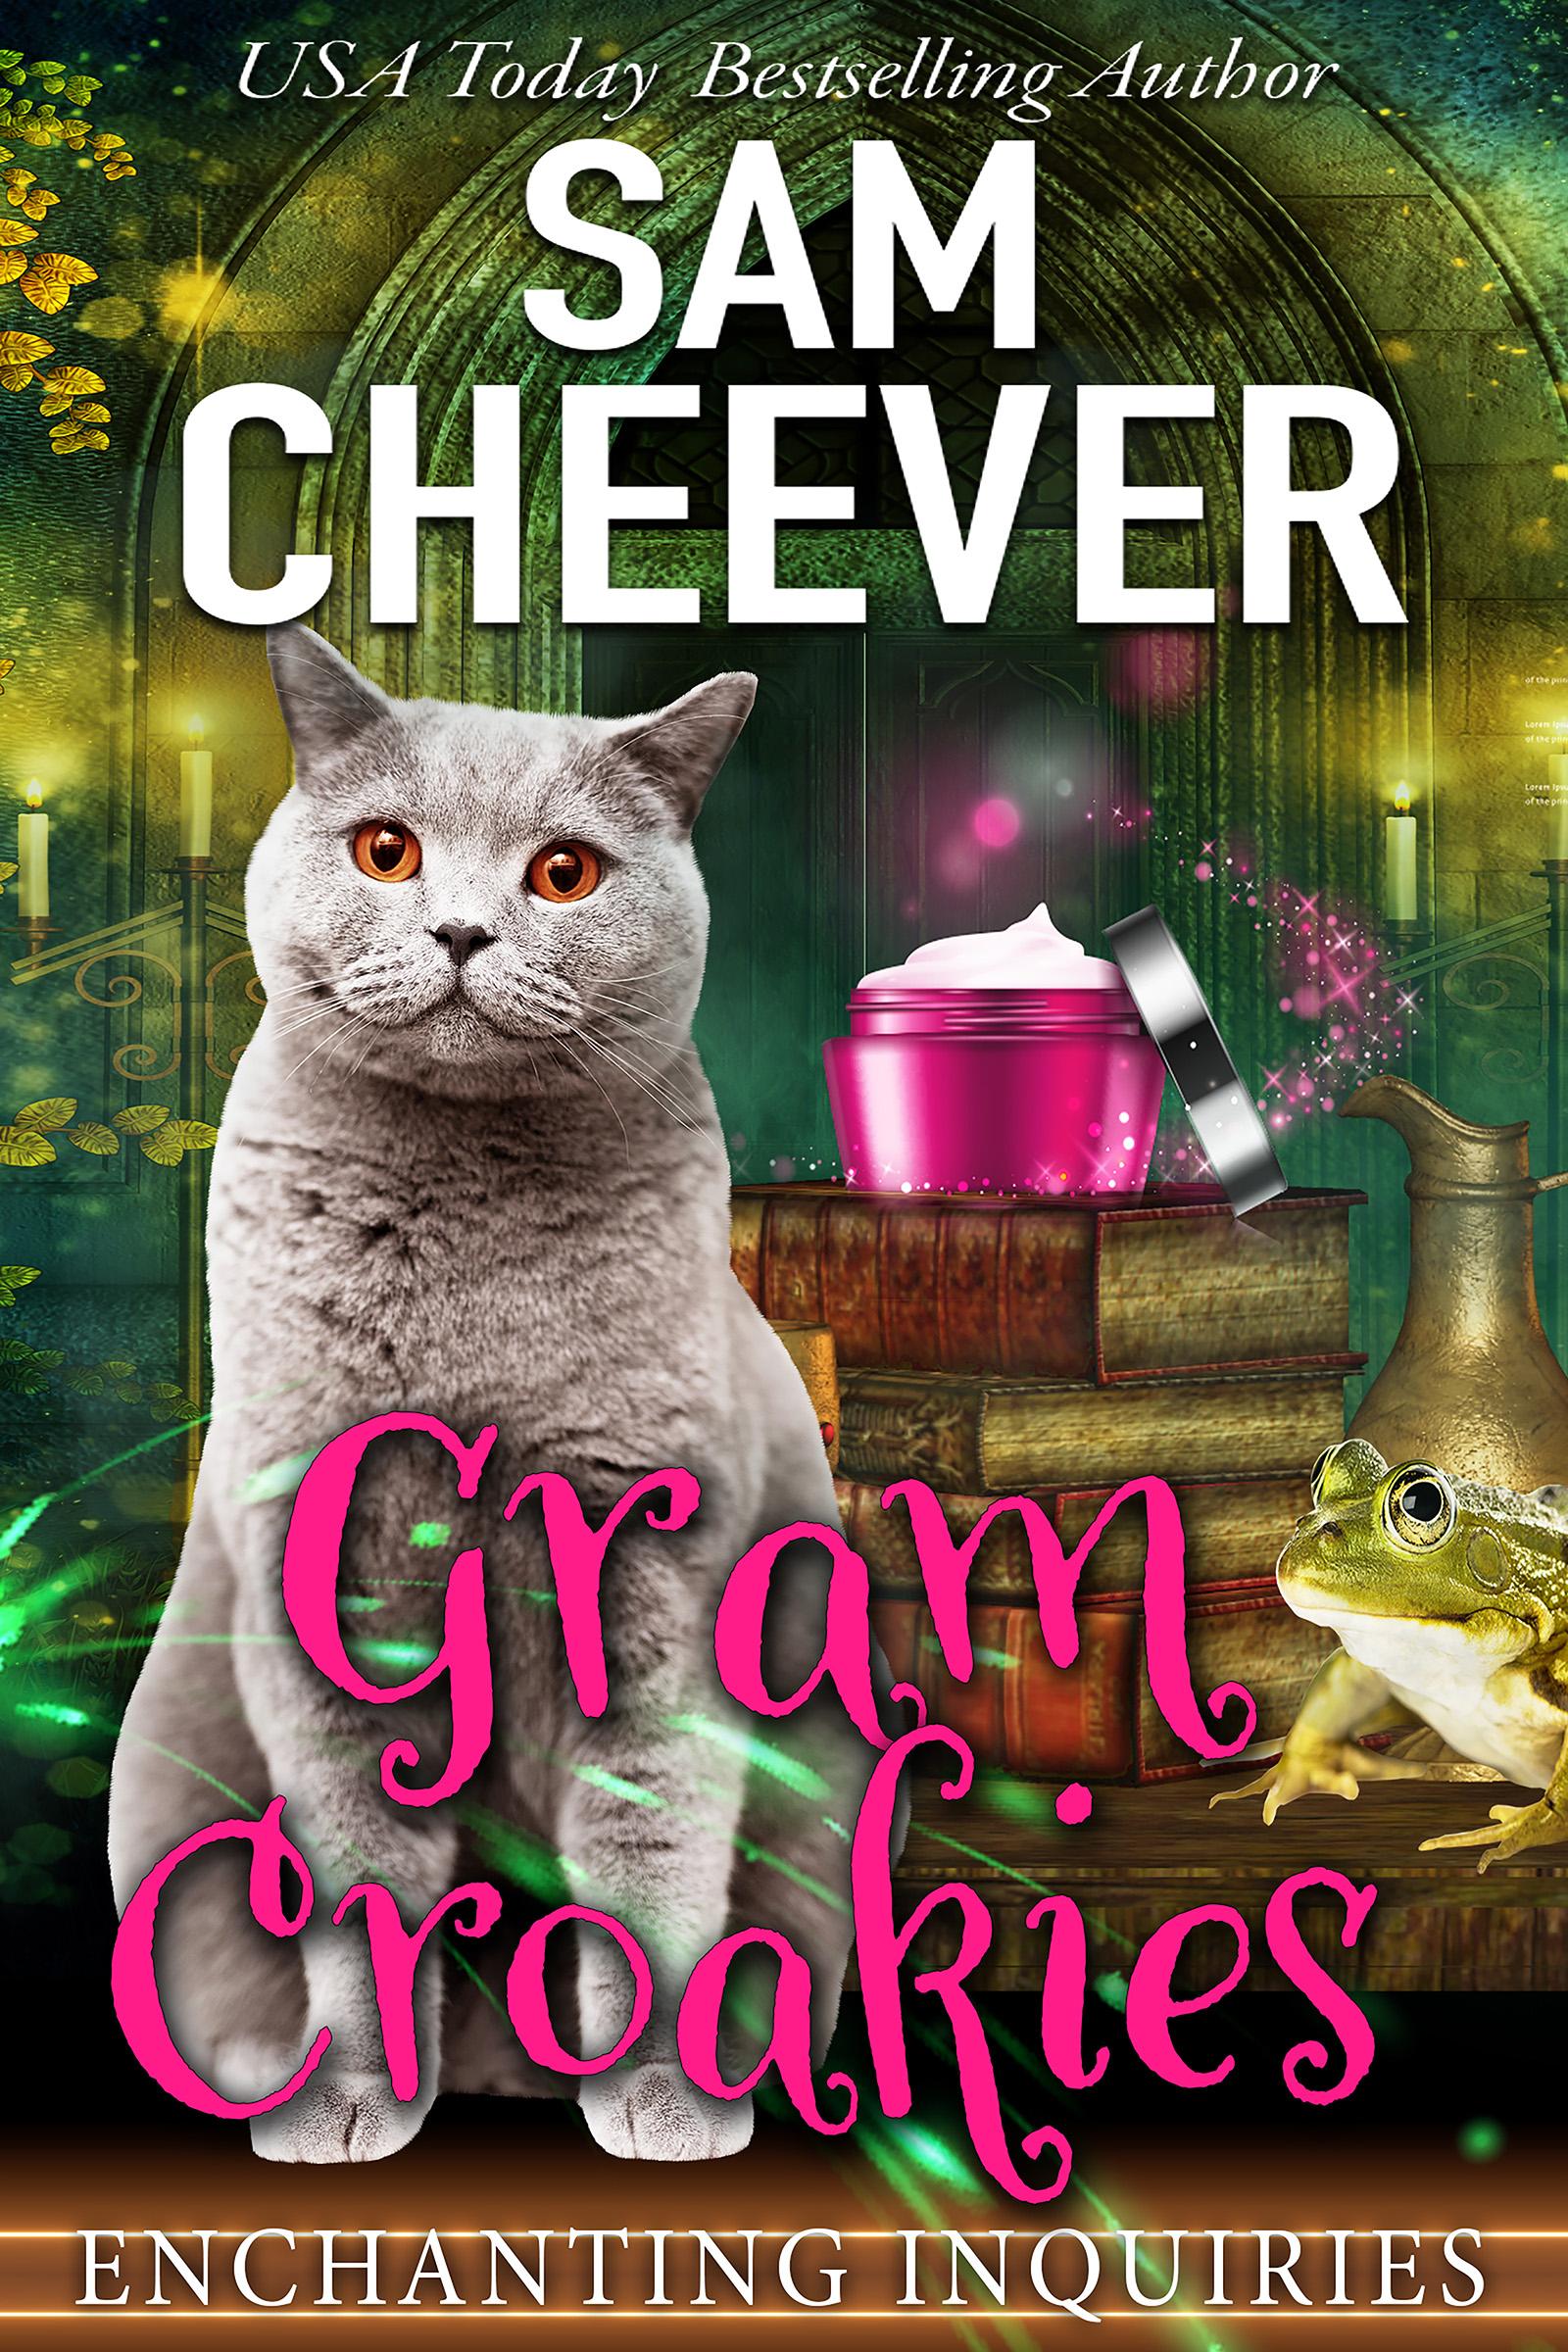 Gram Croakies OTHER SITES